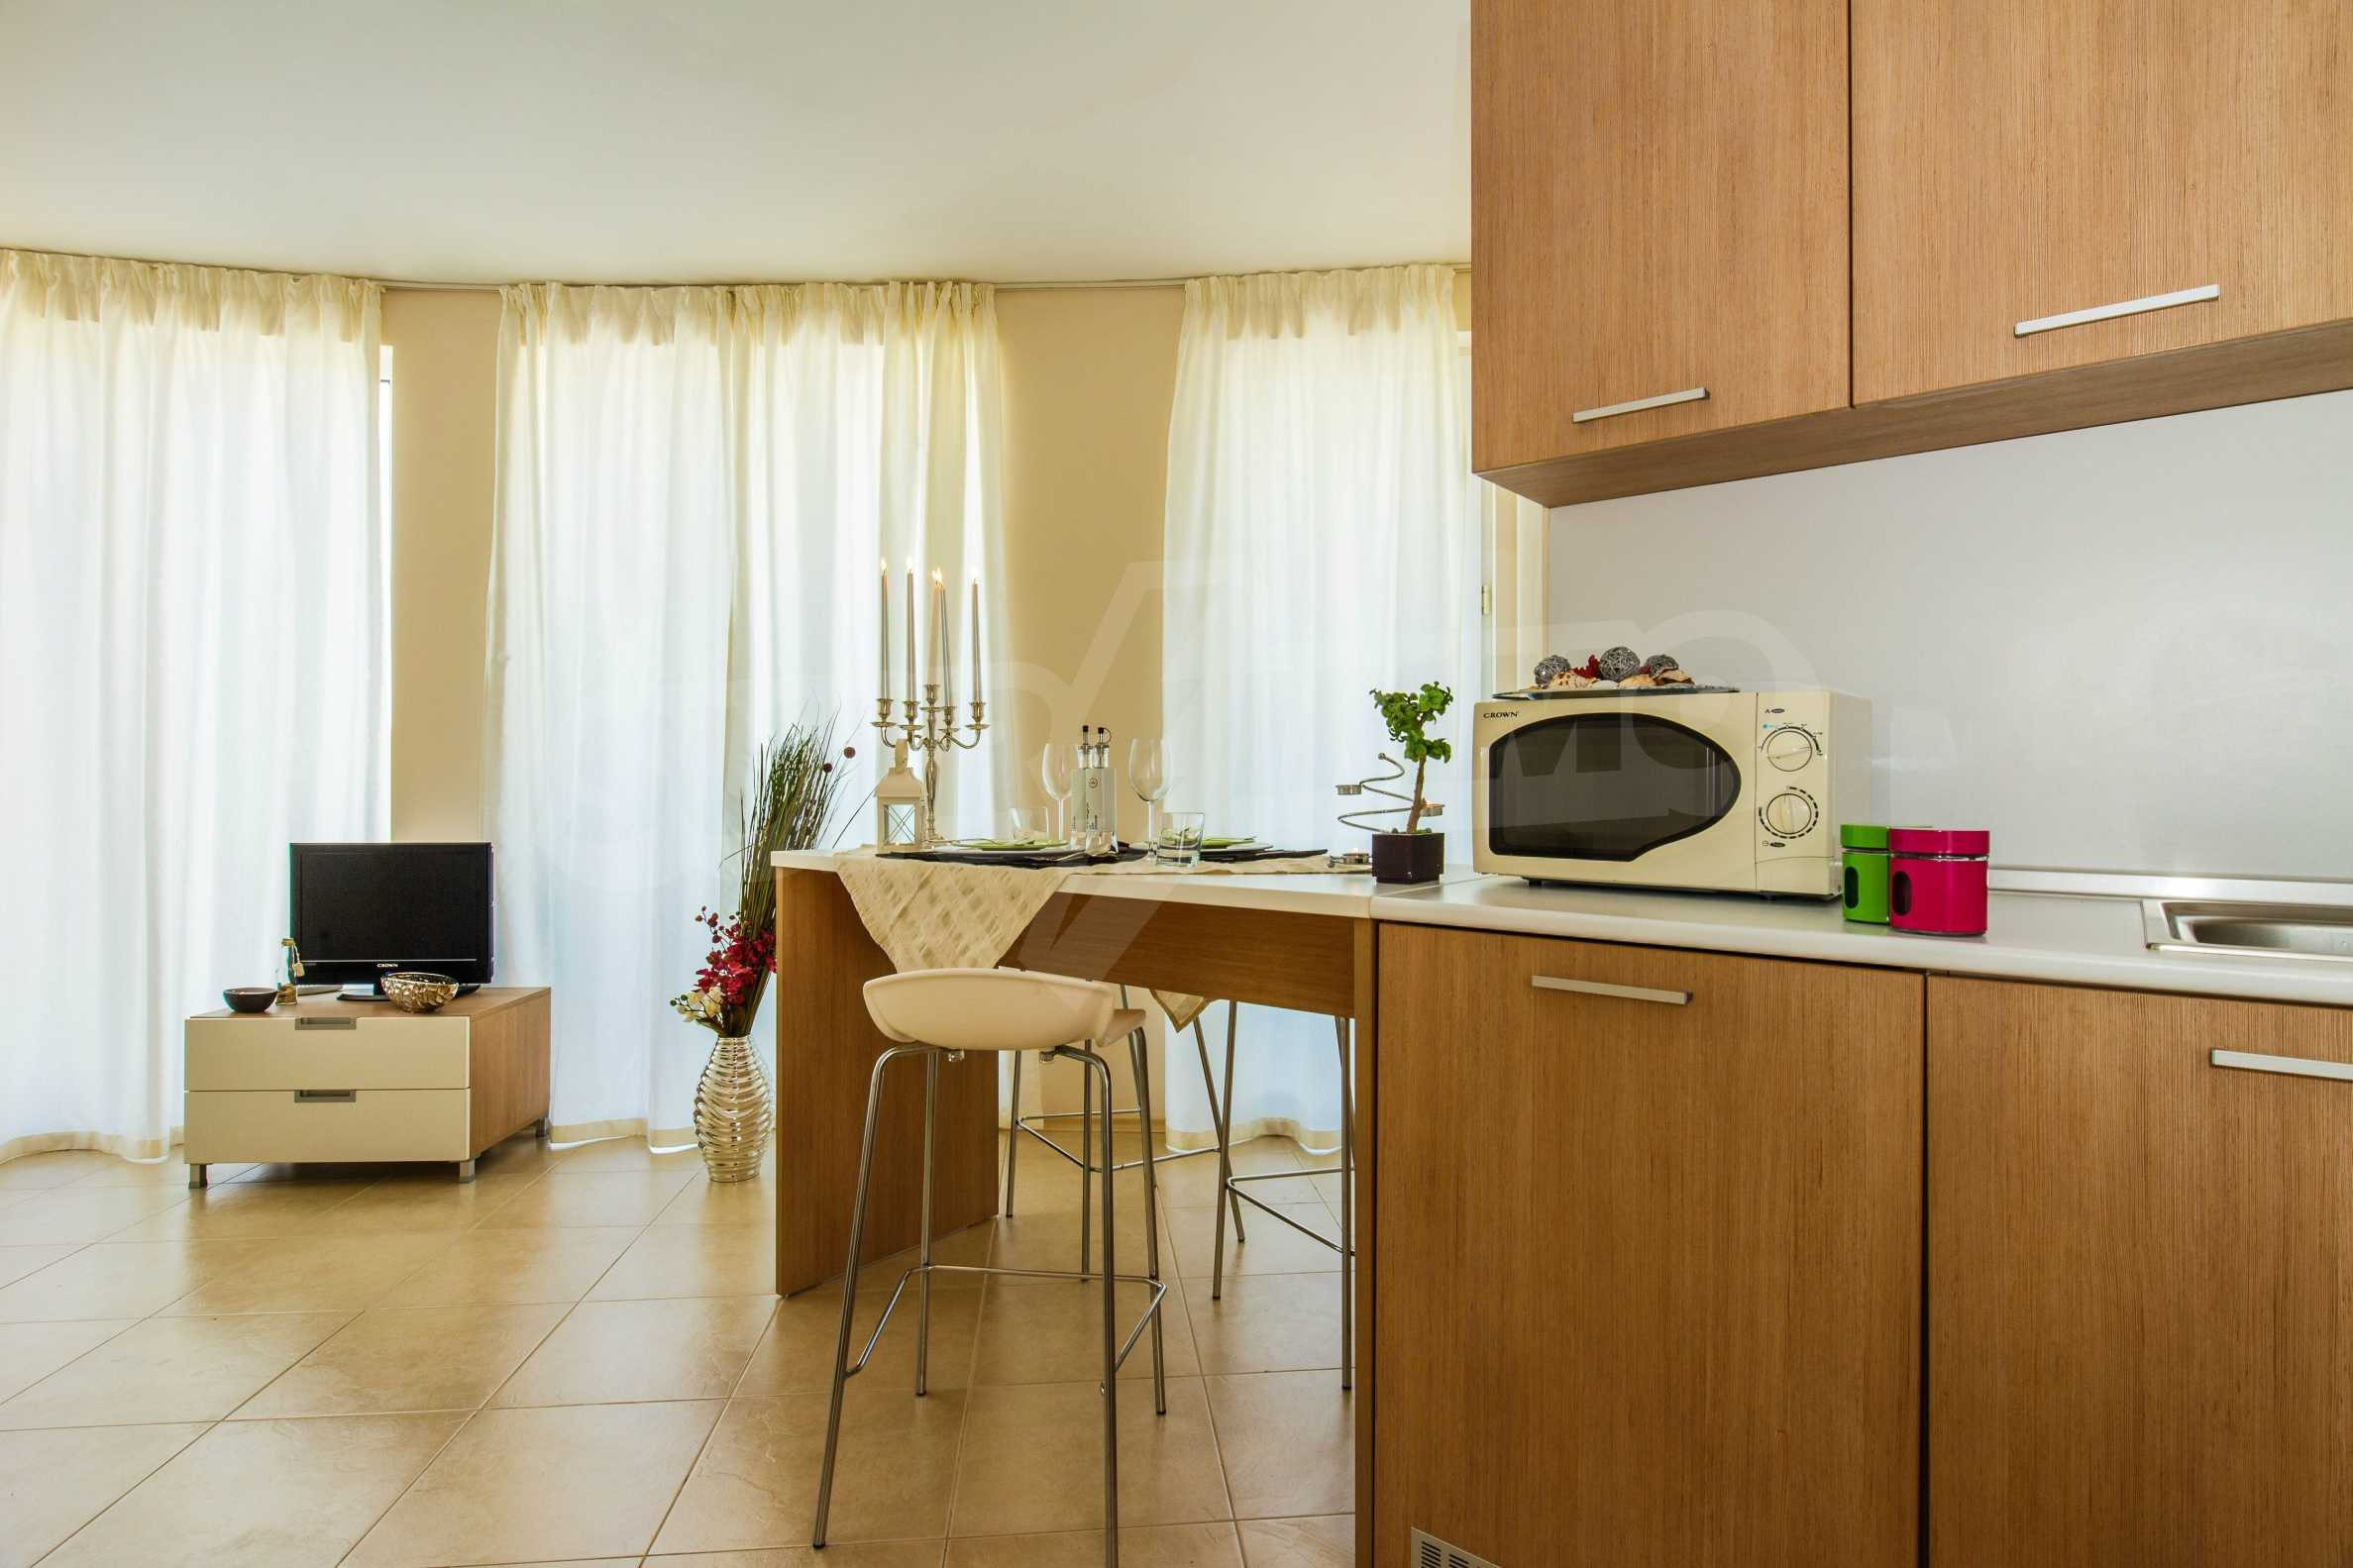 Тристаен апартамент в комплекс Емберли близо до плажа в Лозенец (ап. №423) 10